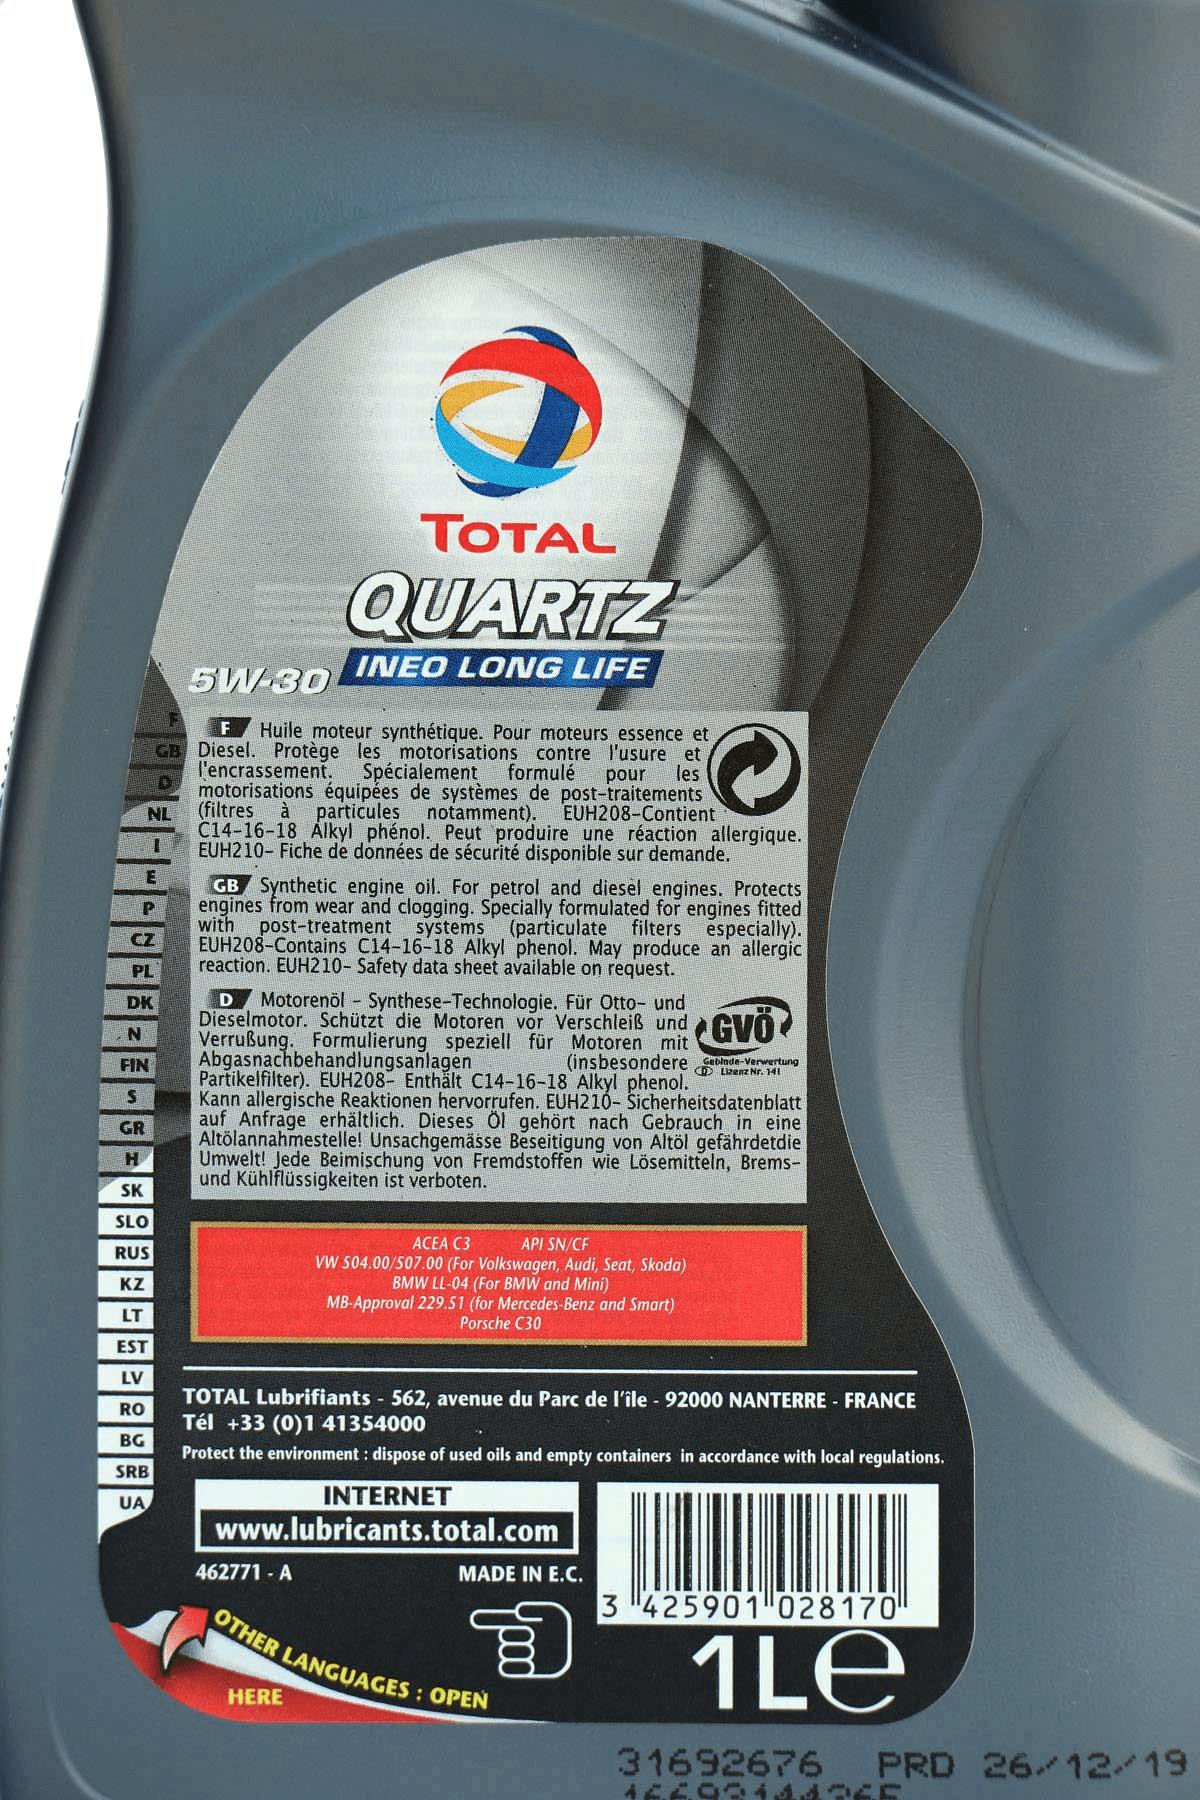 Total Quartz INEO LONG LIFE 5W-30 Motoröl, 1l